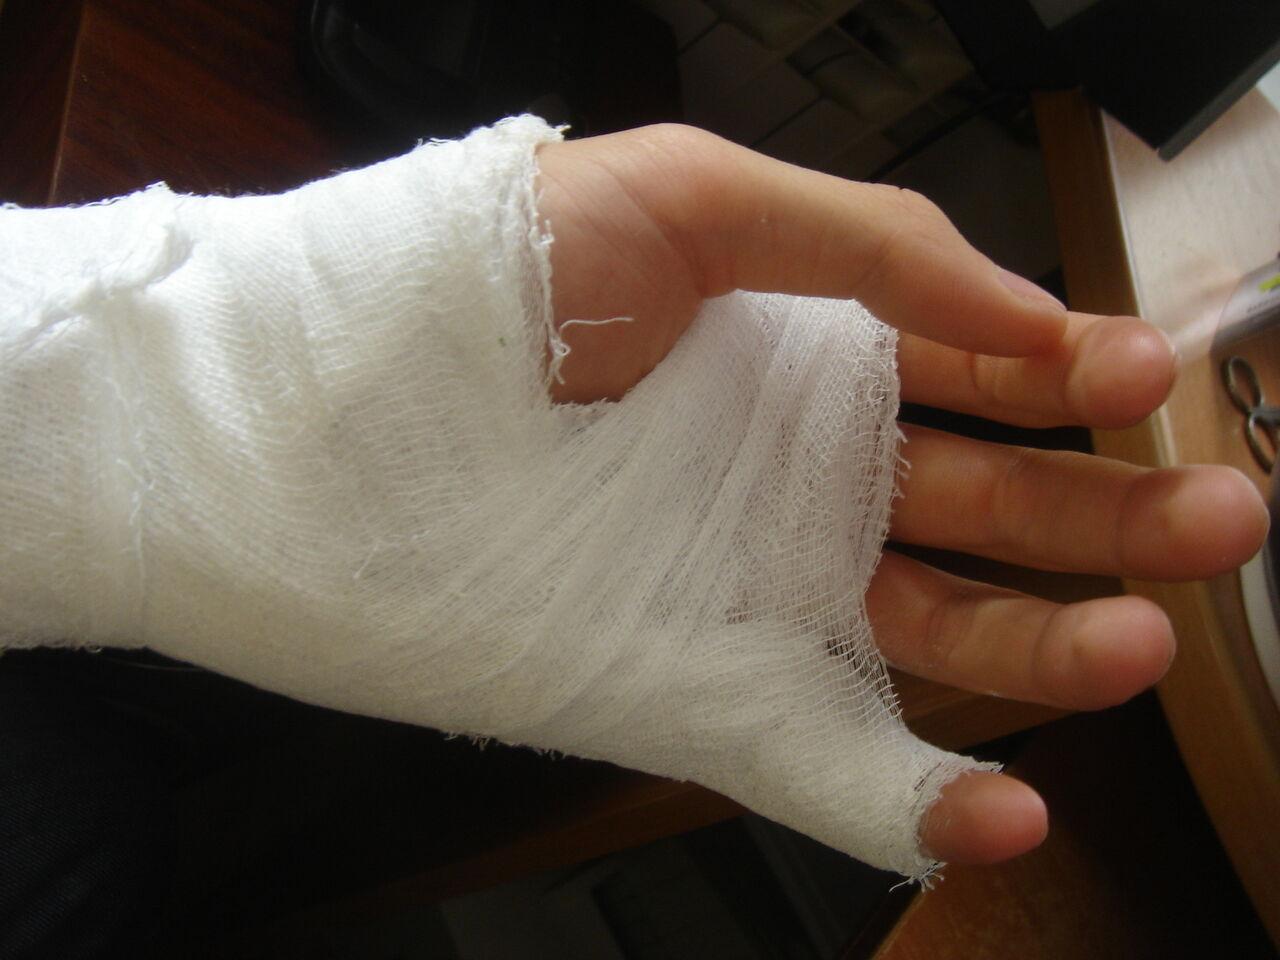 Кузбасс: школьнику заплатят 50 000 руб. засломанный палец